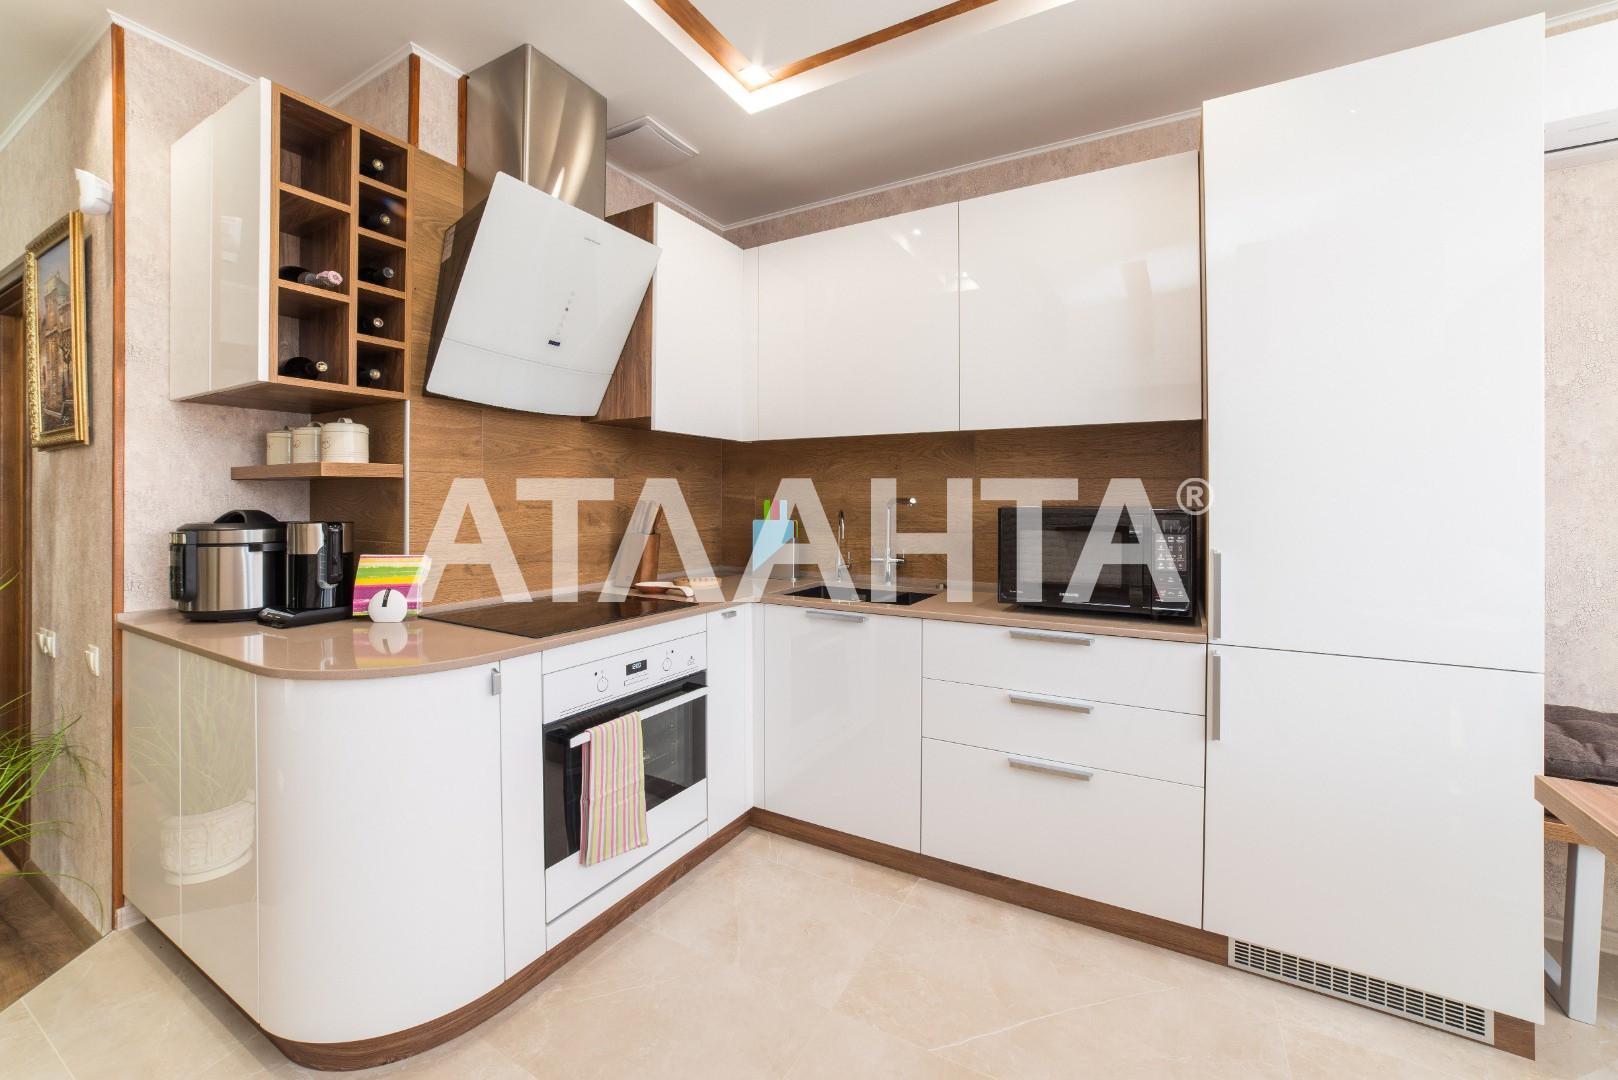 Продается 1-комнатная Квартира на ул. Балковская (Фрунзе) — 50 000 у.е. (фото №7)